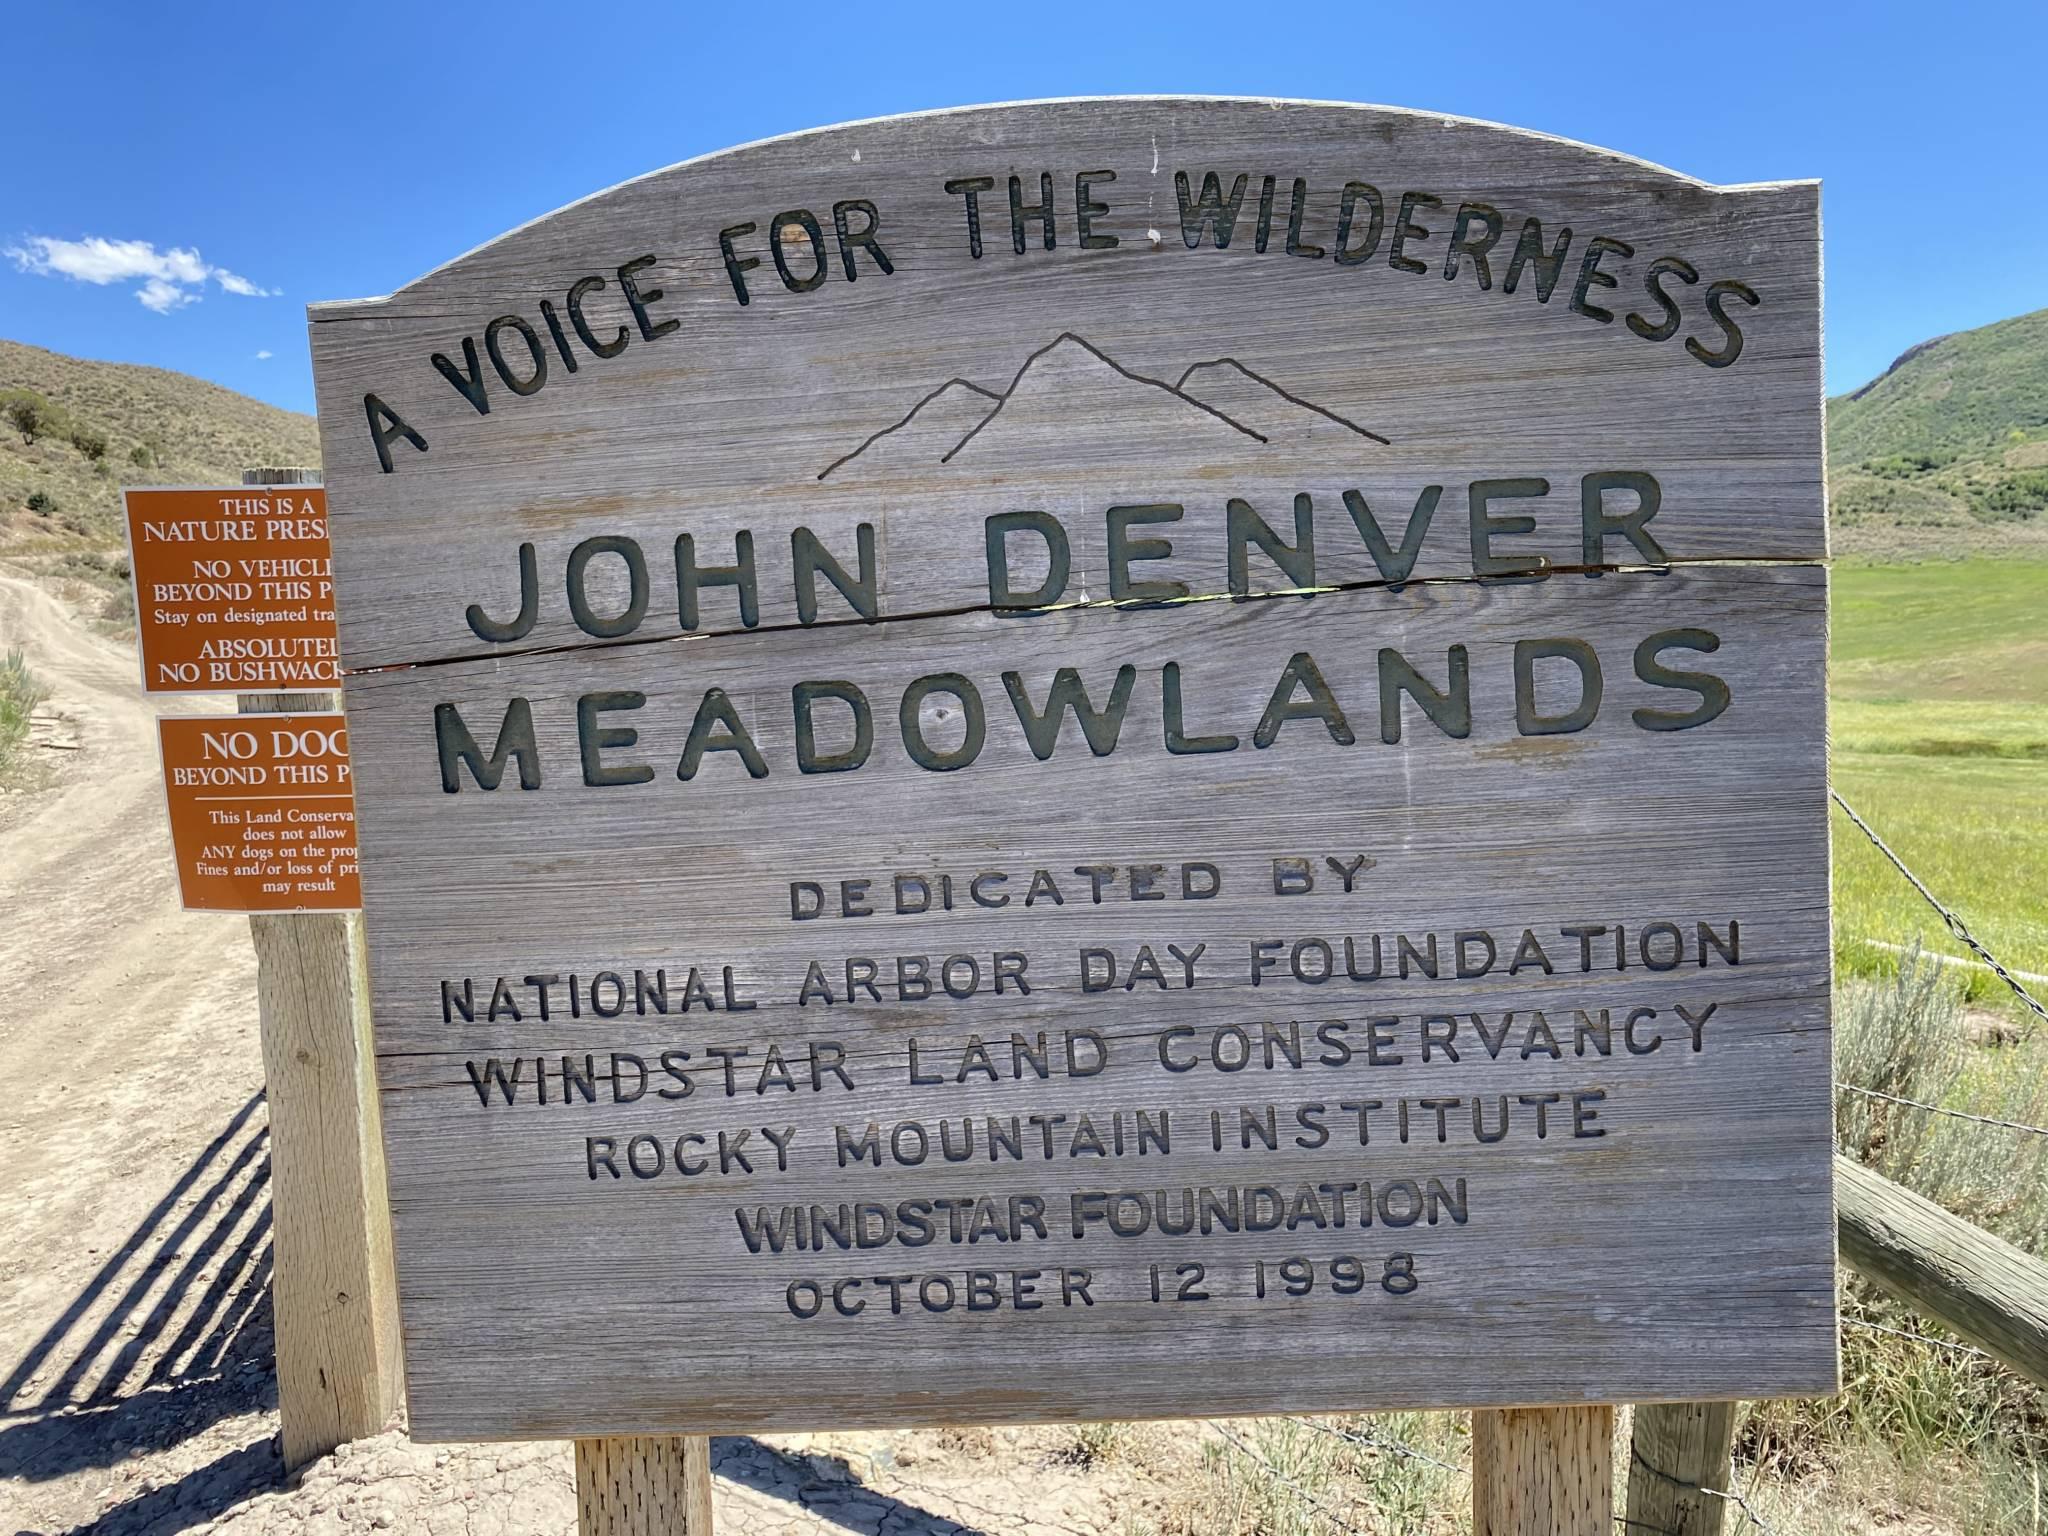 John Denver Meadowlands